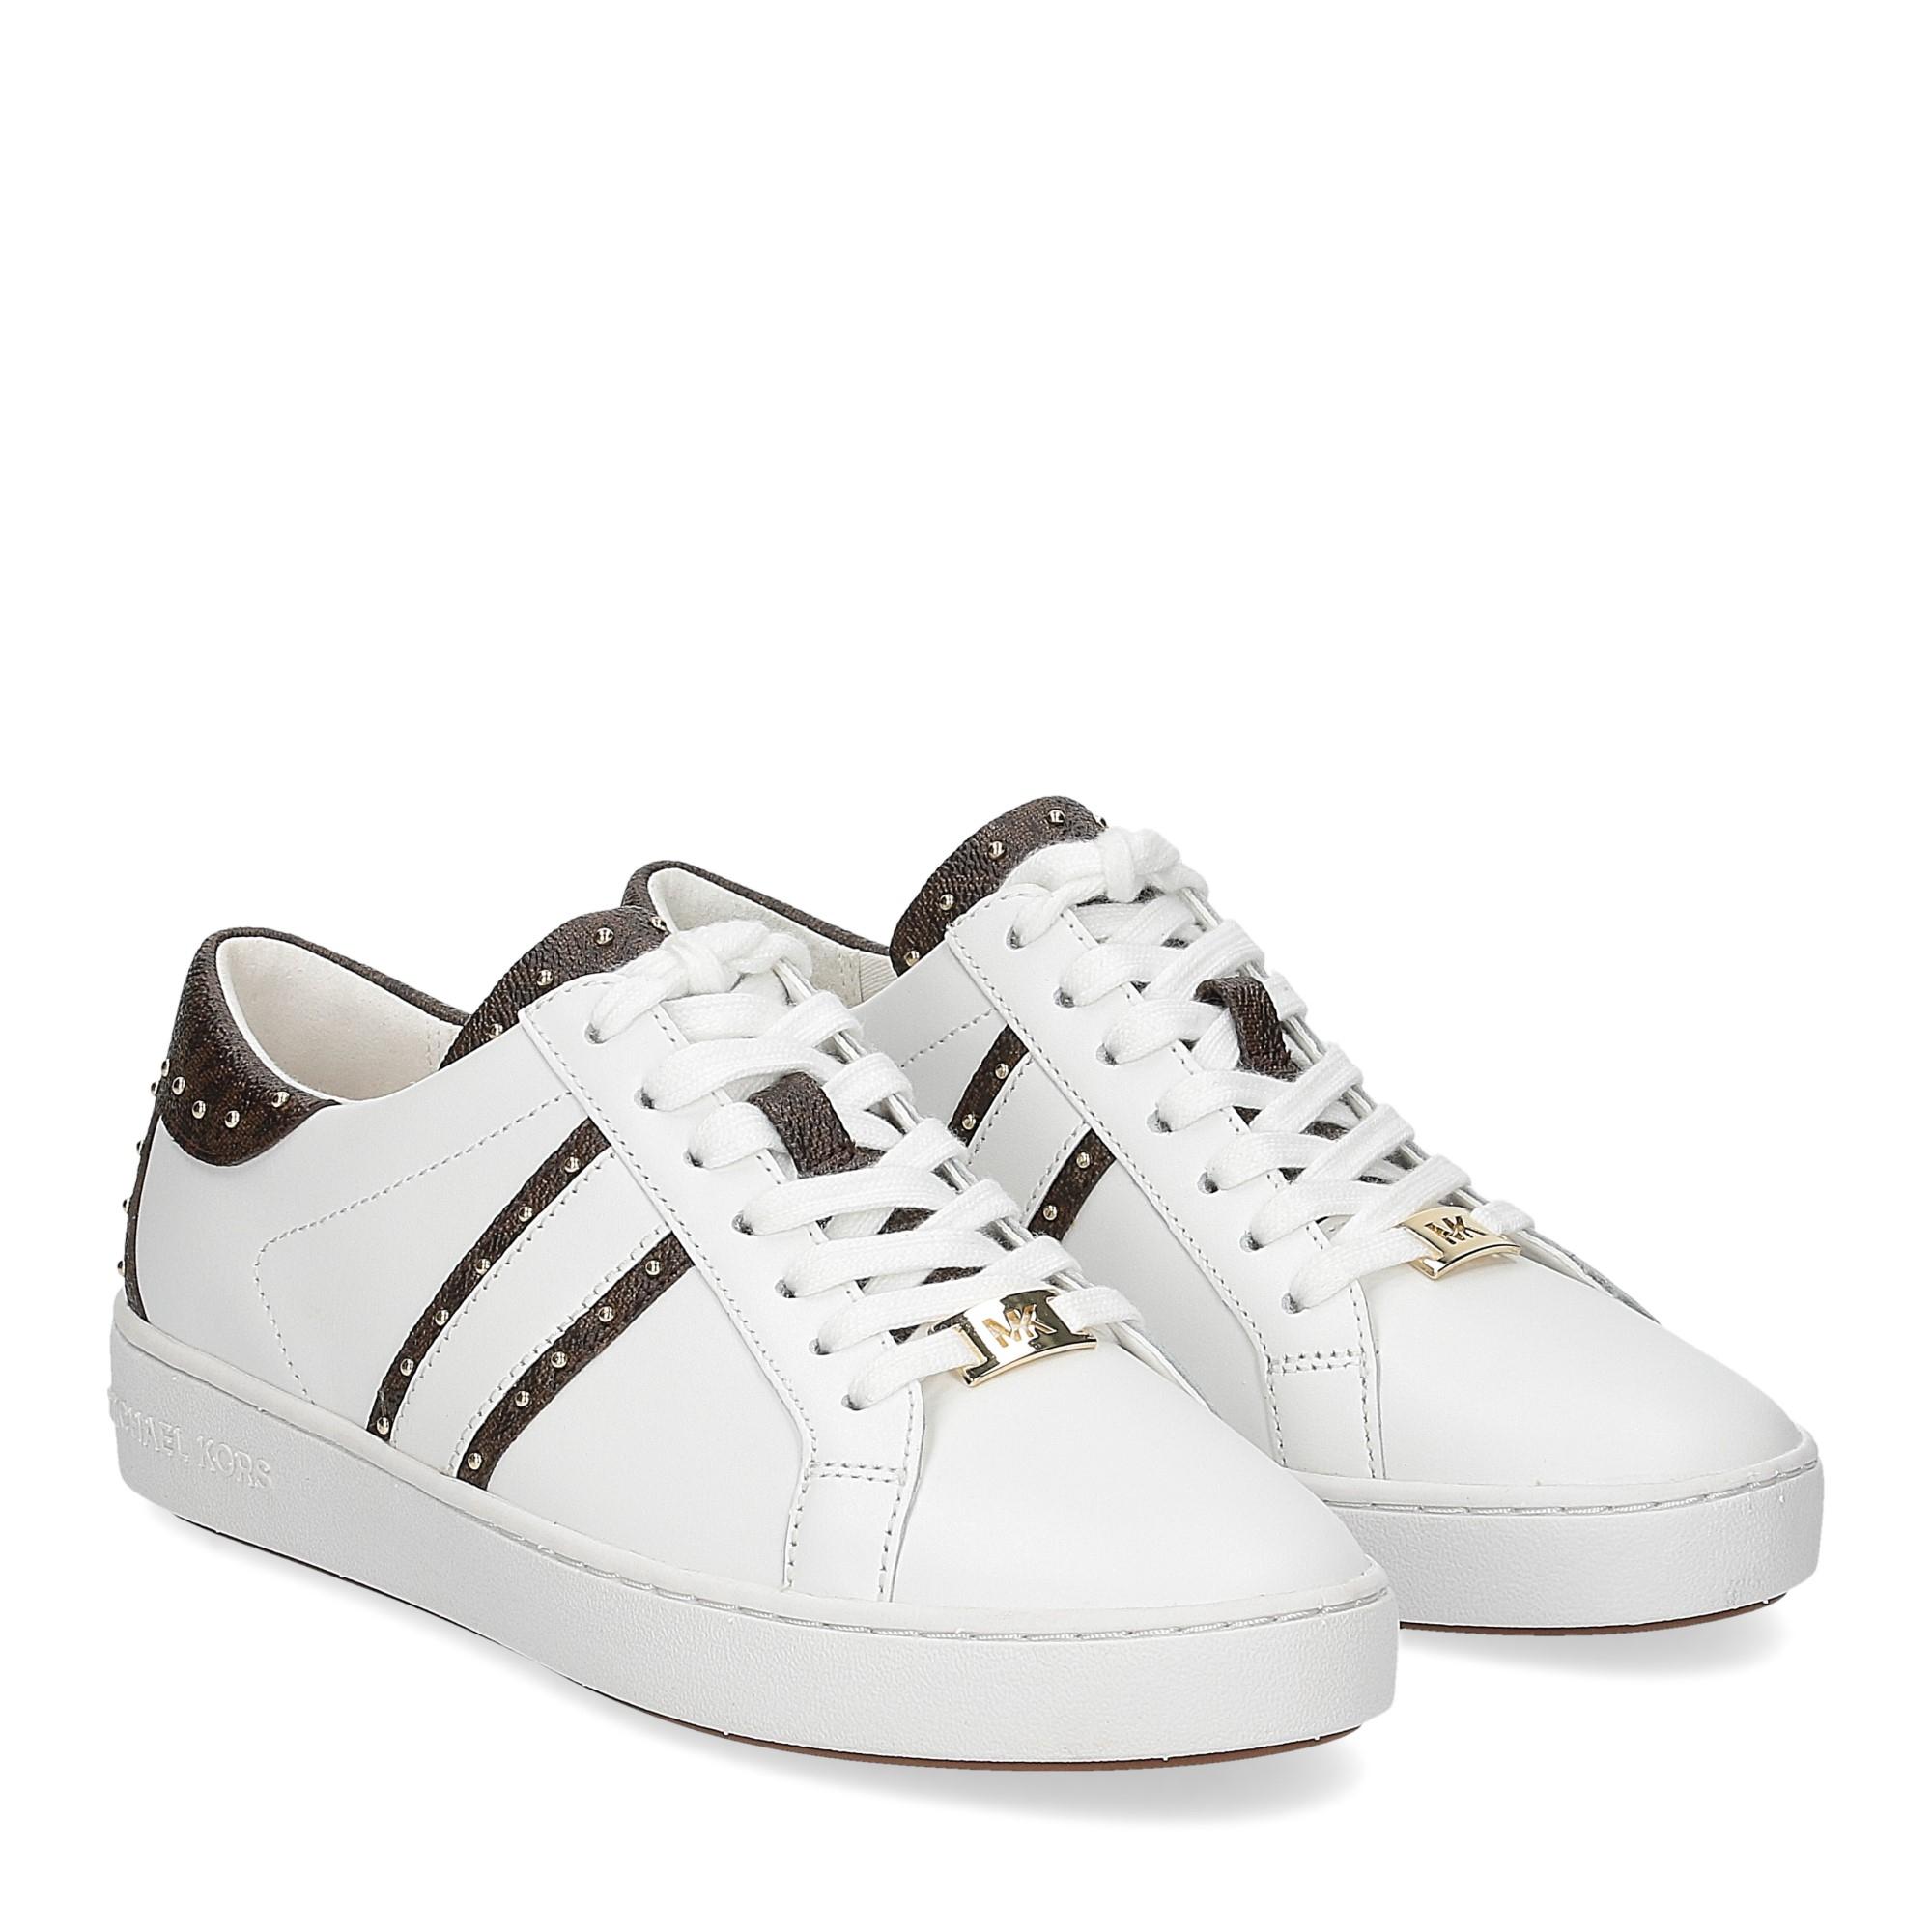 Michael KorsKeaton stripe optic white leather brown